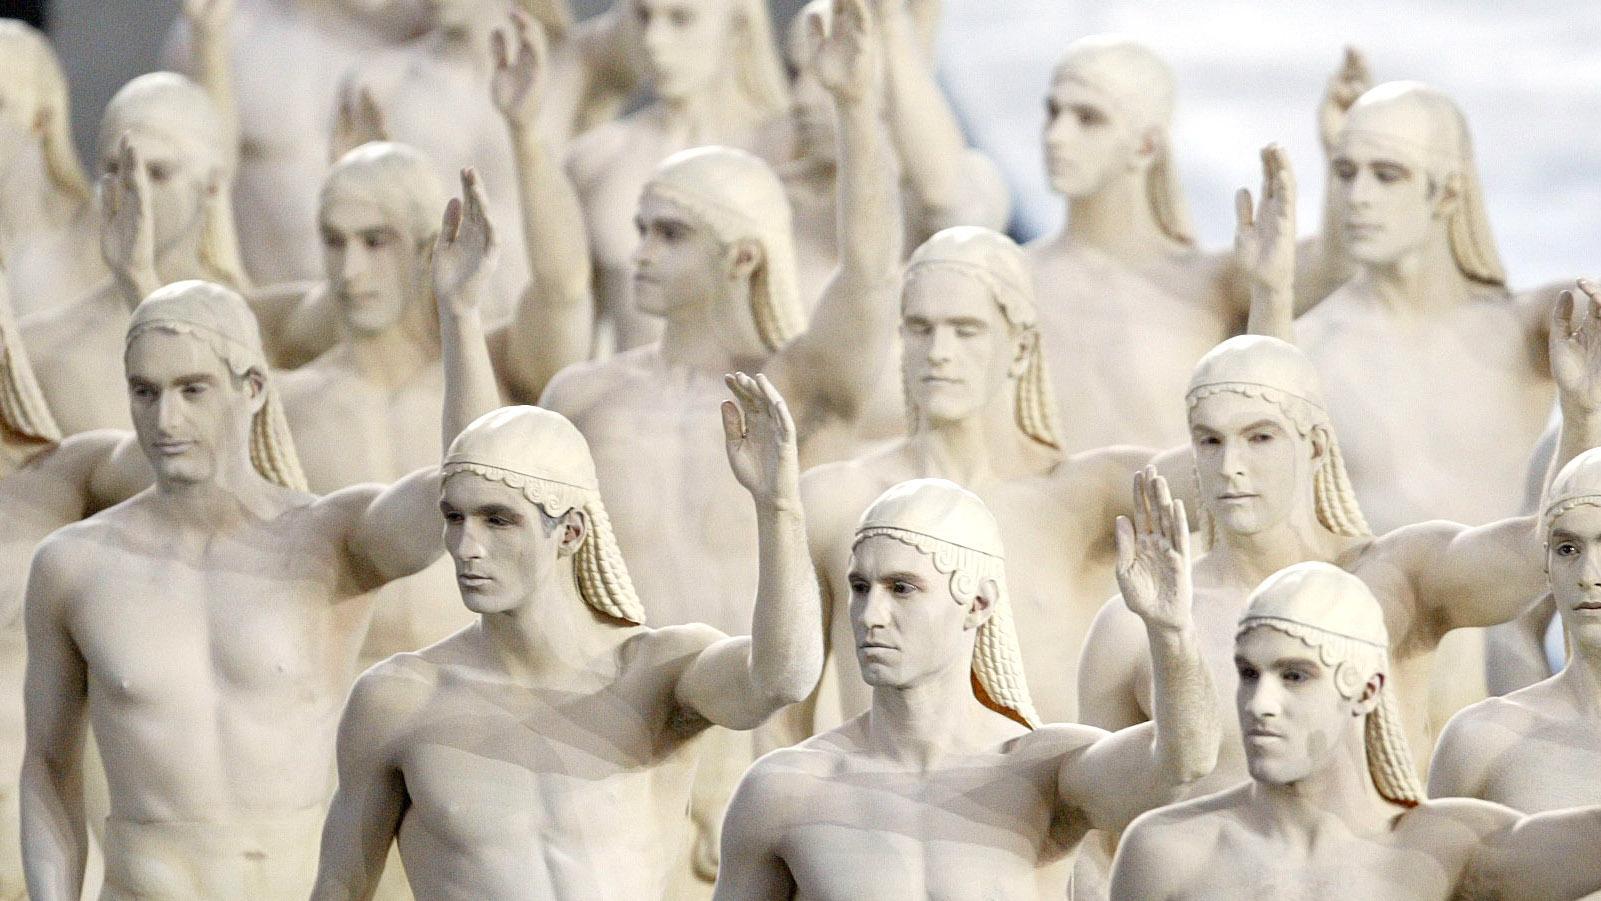 men dressed up as greek statues